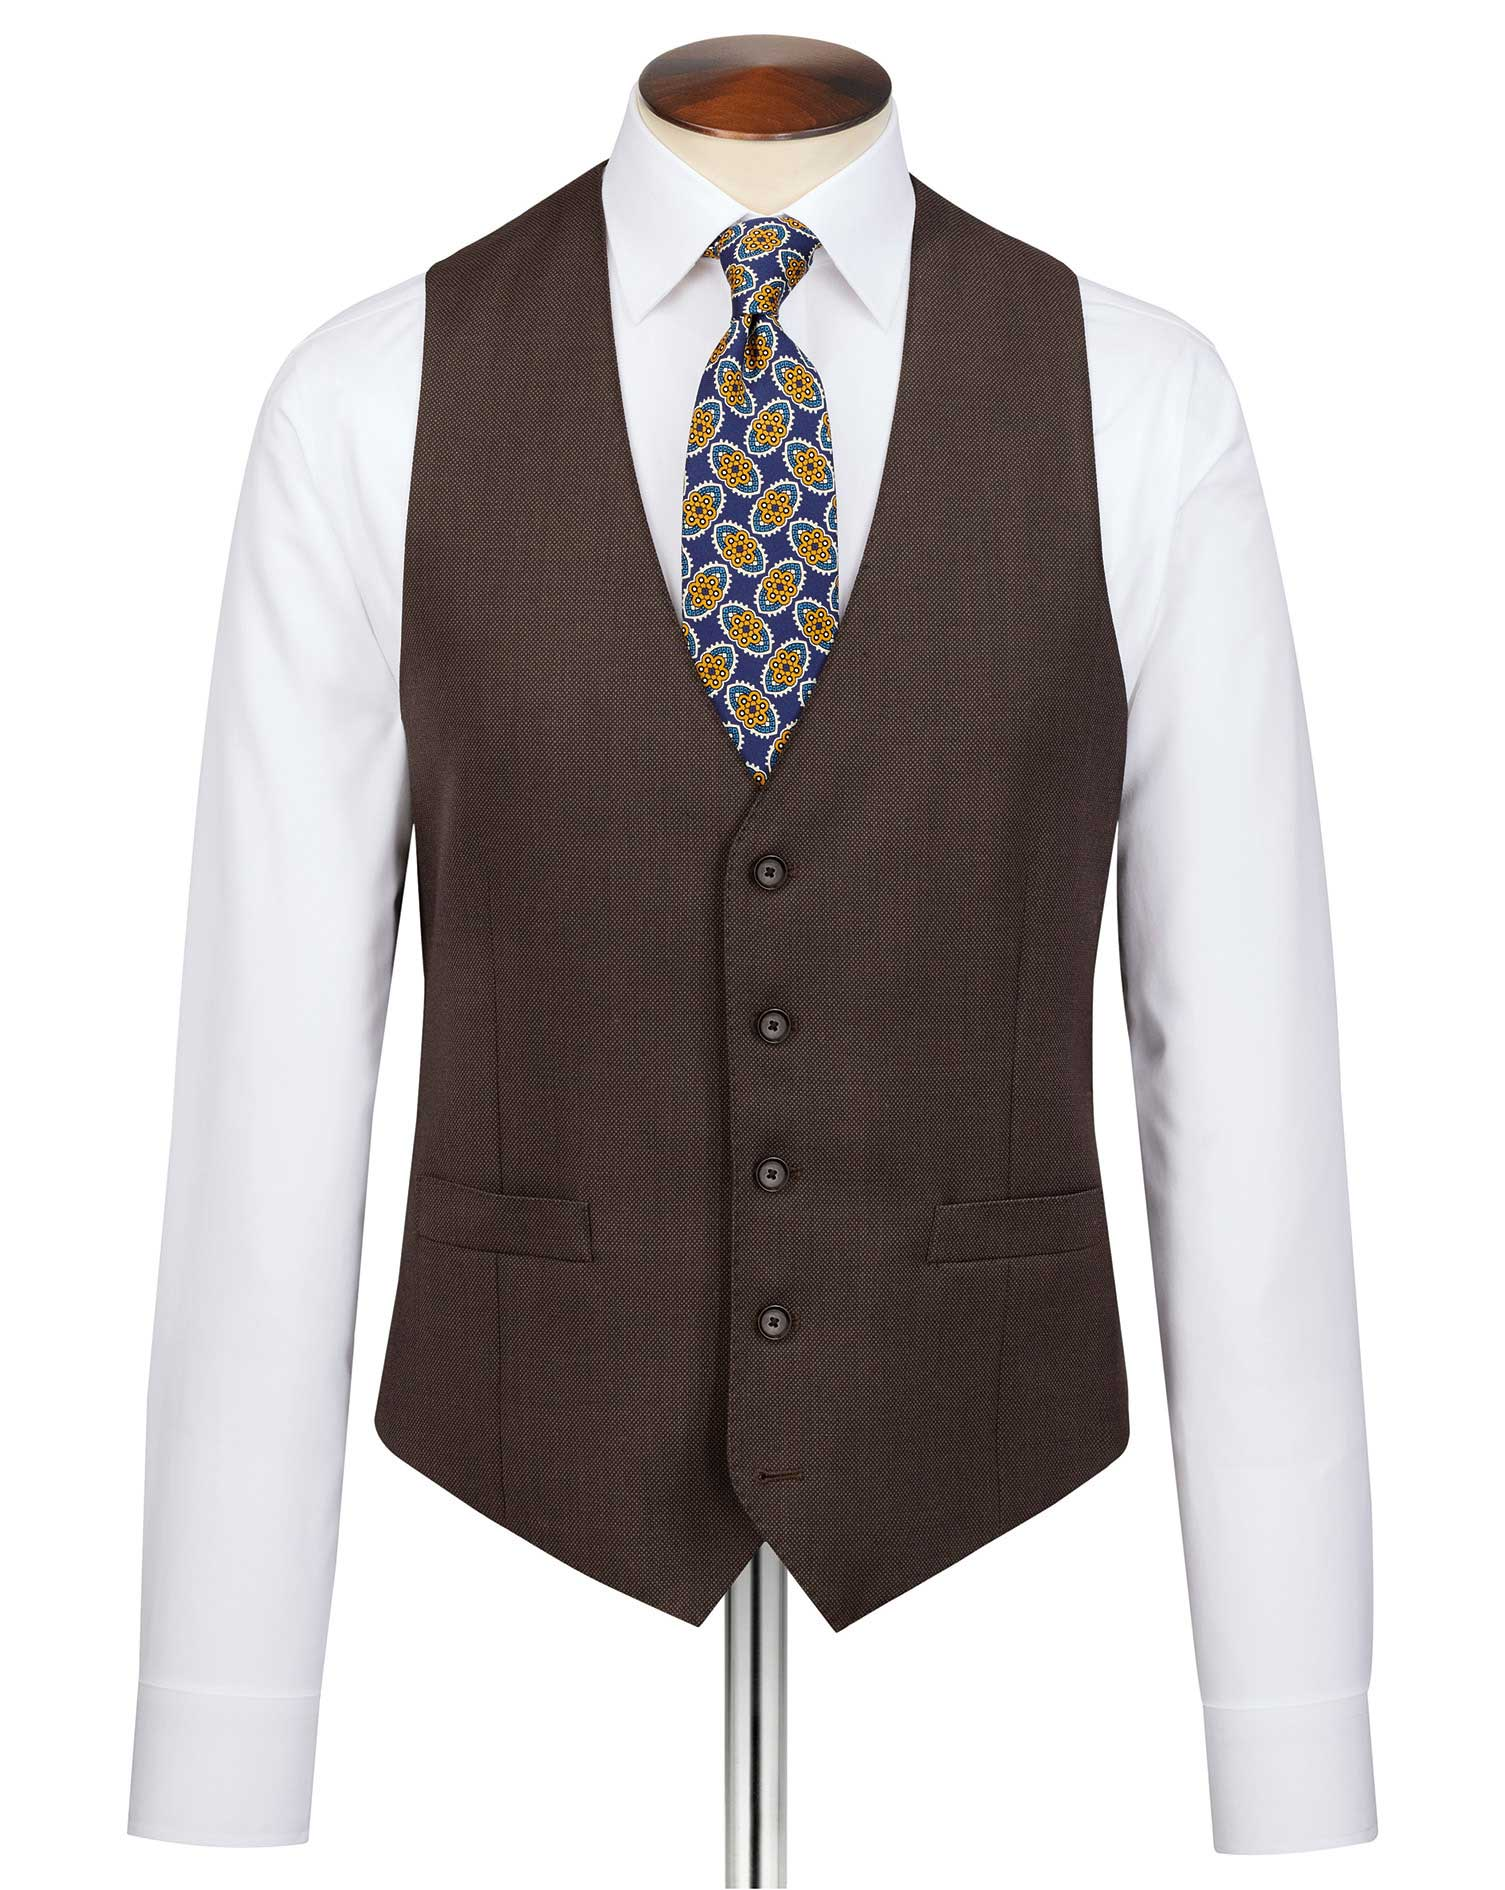 Brown Slim Fit Birdseye Travel Suit Wool Waistcoat Size w38 by Charles Tyrwhitt